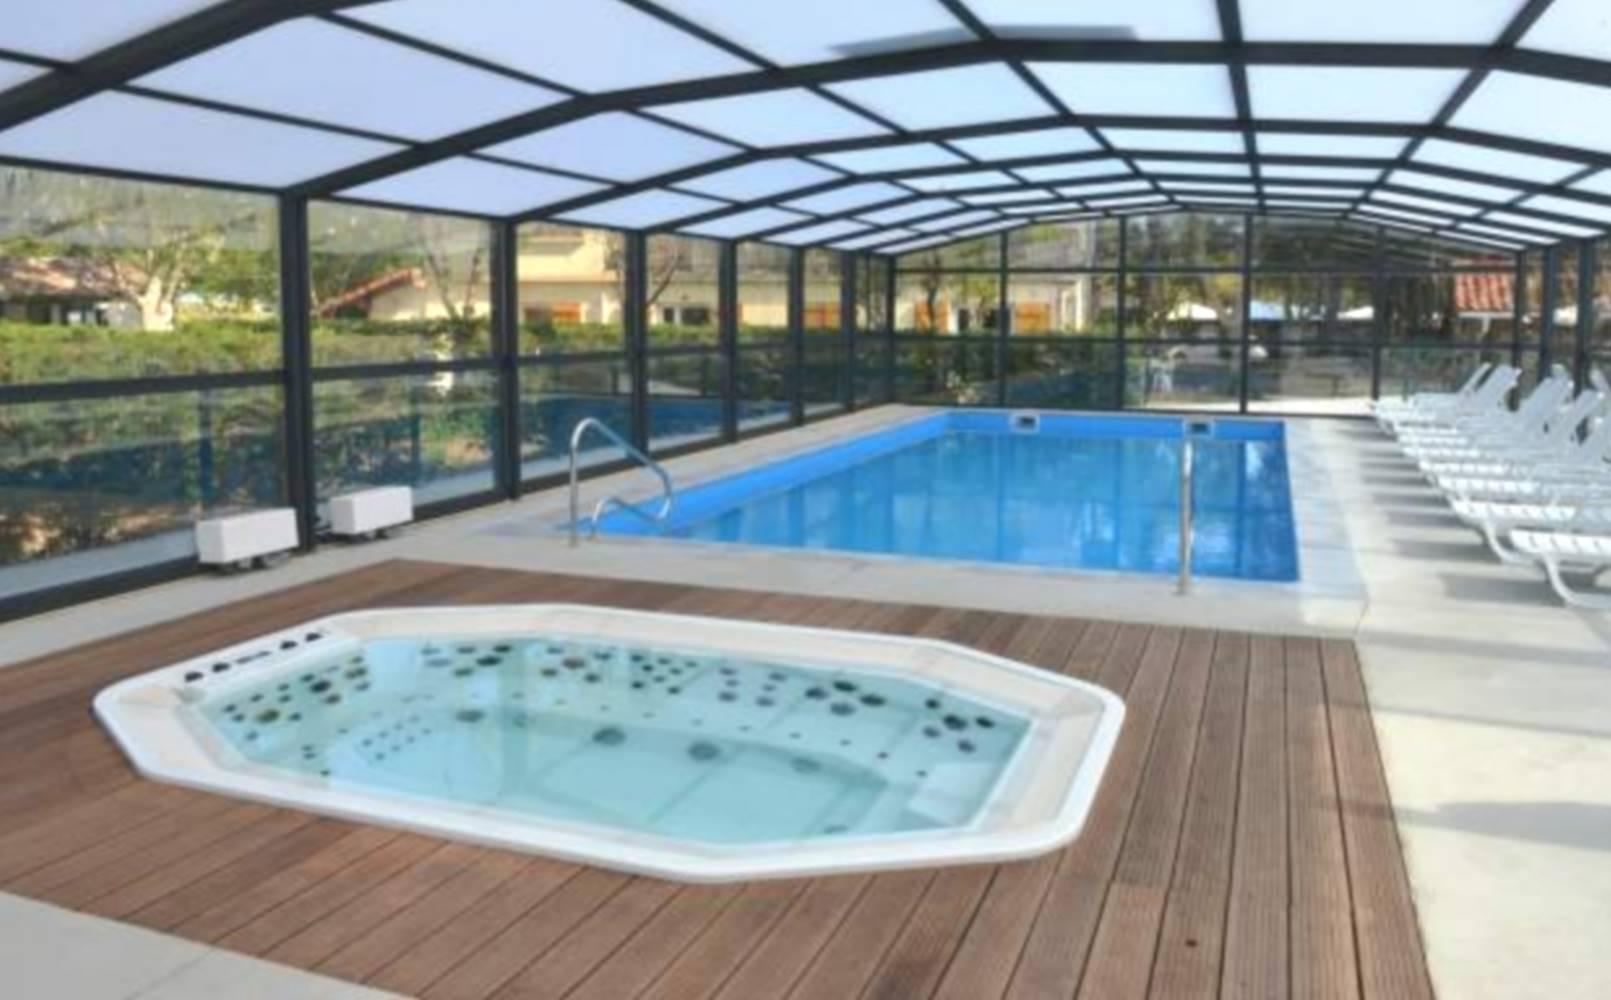 TY FOUKENN - location insolite grande piscine (location-morbihan-sud.com) ©